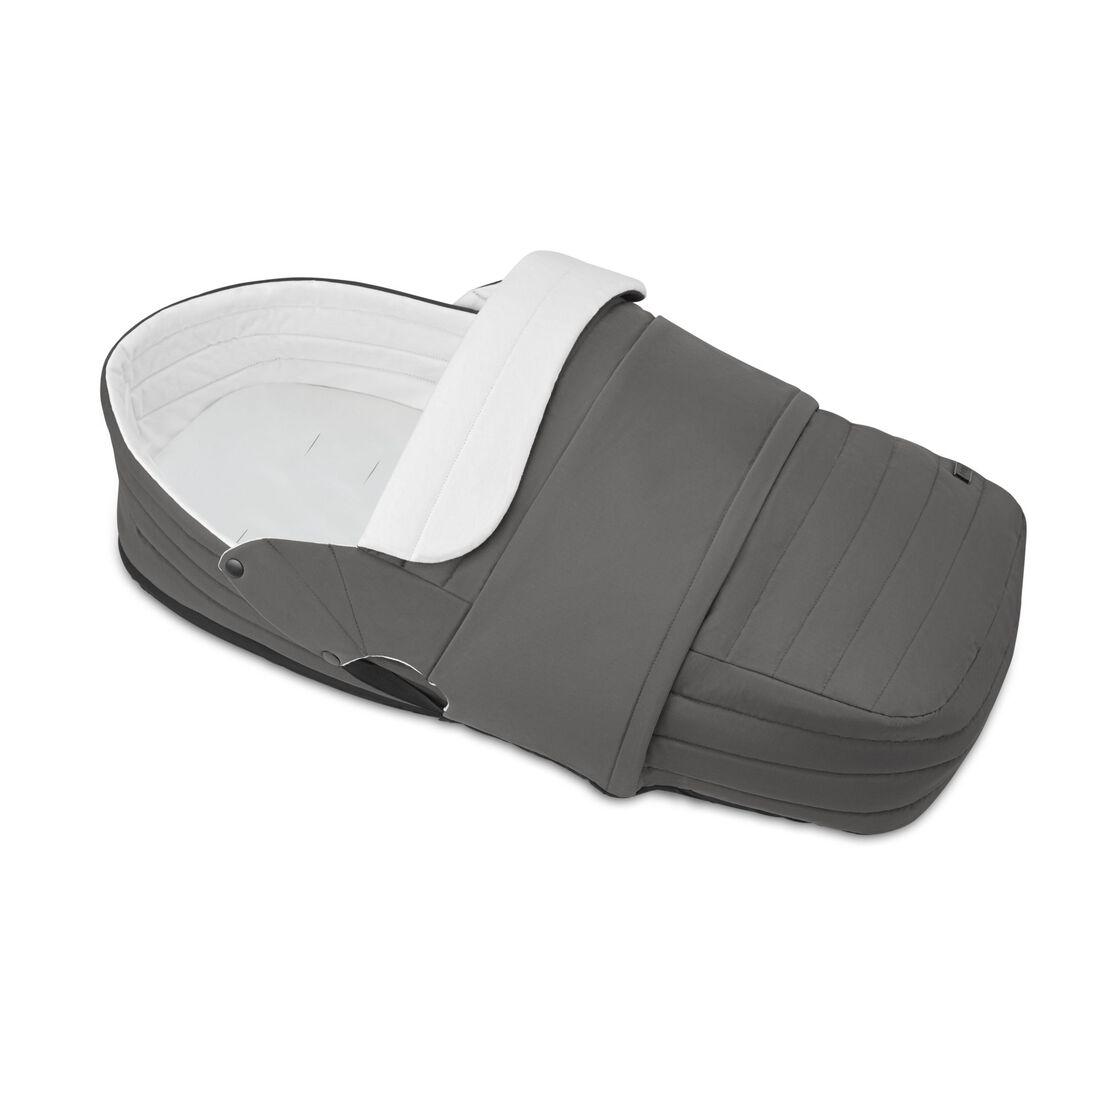 CYBEX Lite Cot - Soho Grey in Soho Grey large Bild 3